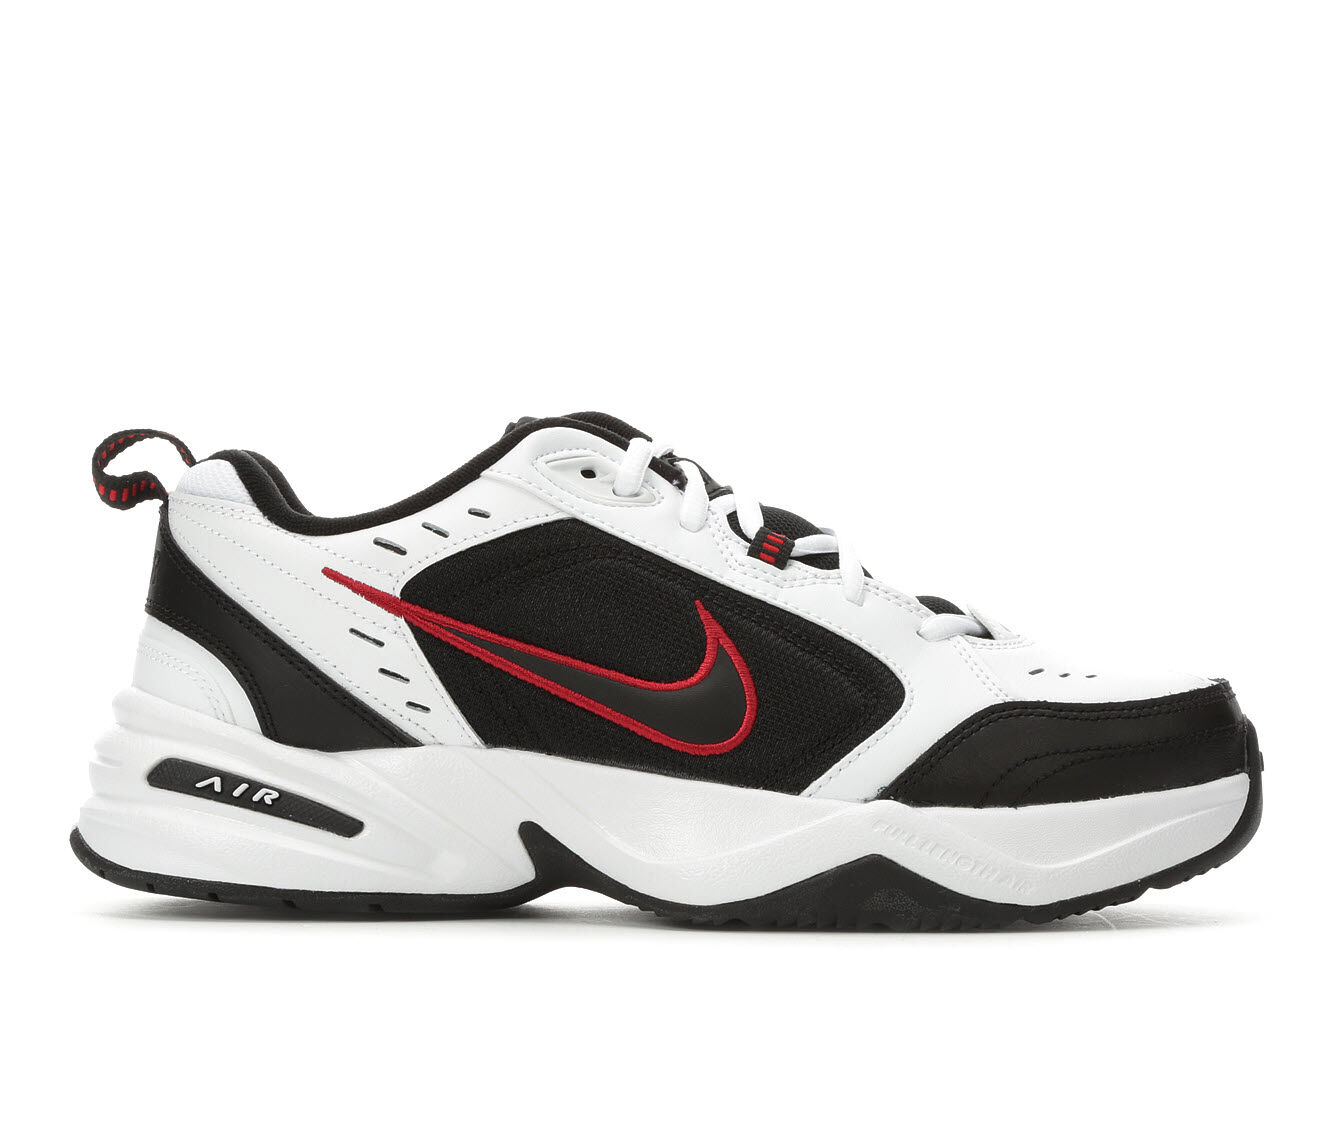 Men's Nike Air Monarch IV Training Shoes Wht/Black/Red